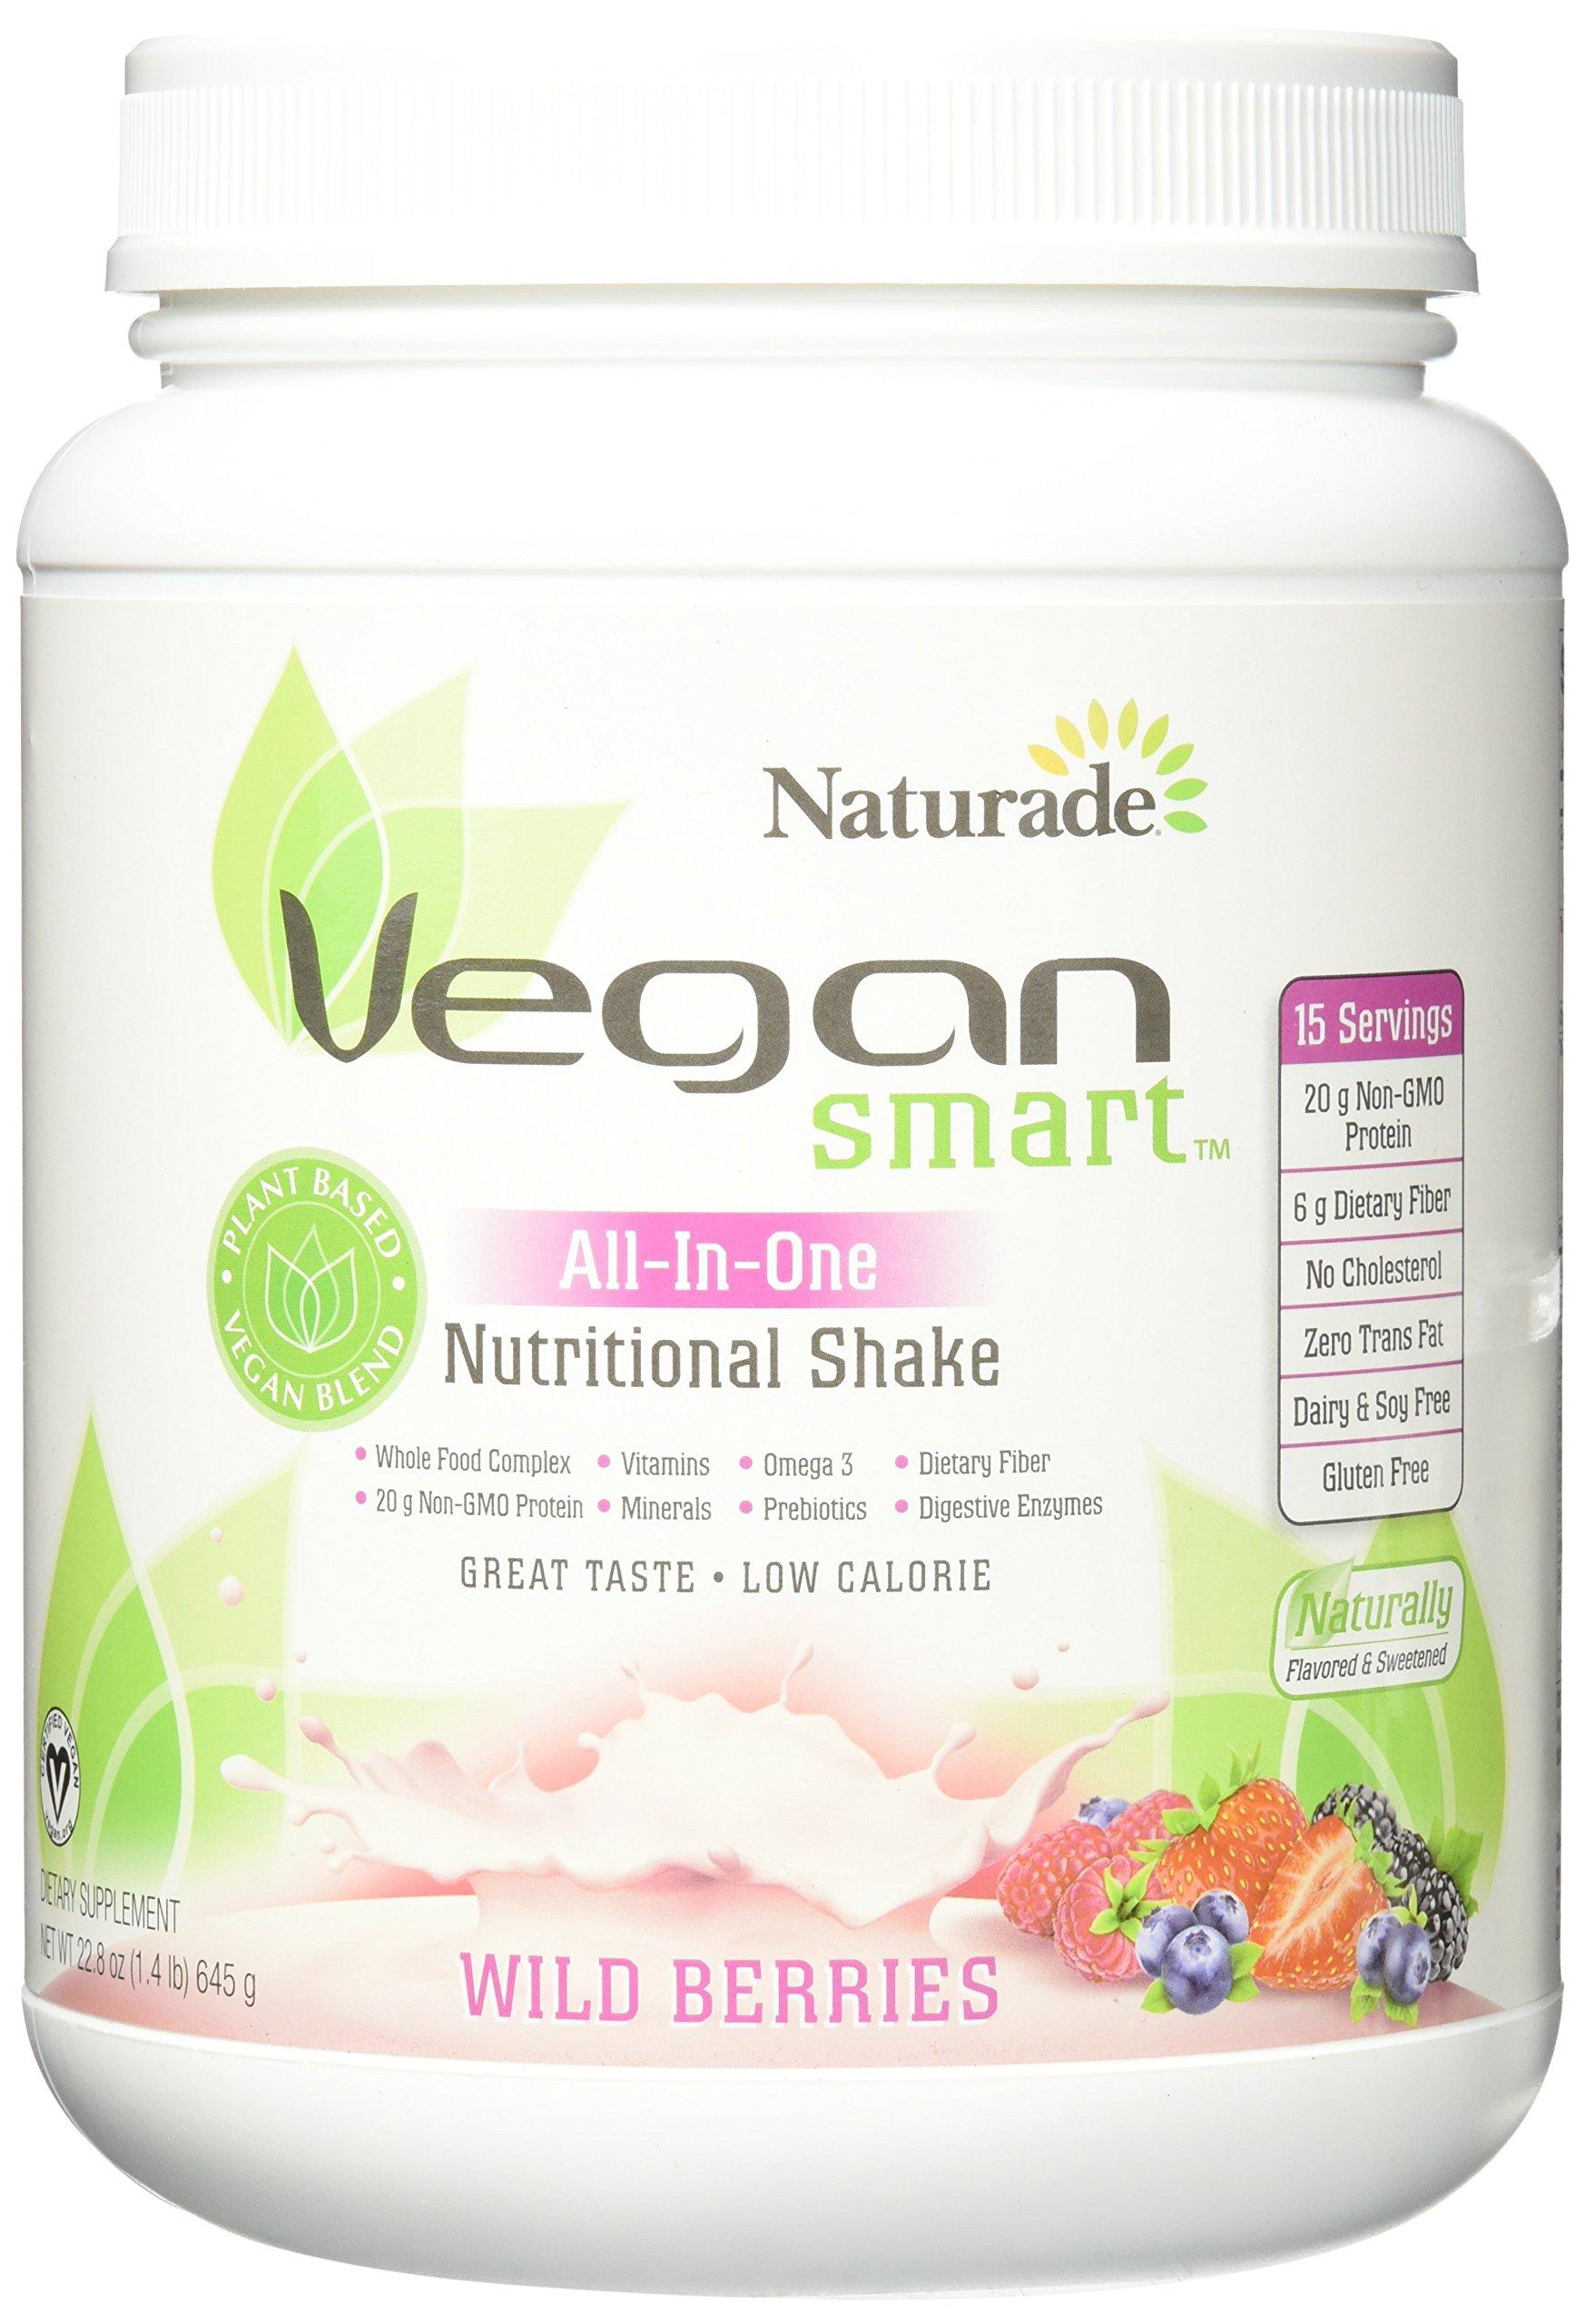 Amazon.com: Naturade Vegansmart All-in-one Nutritional Shake, Vanilla, 22.8 Ounce: Health